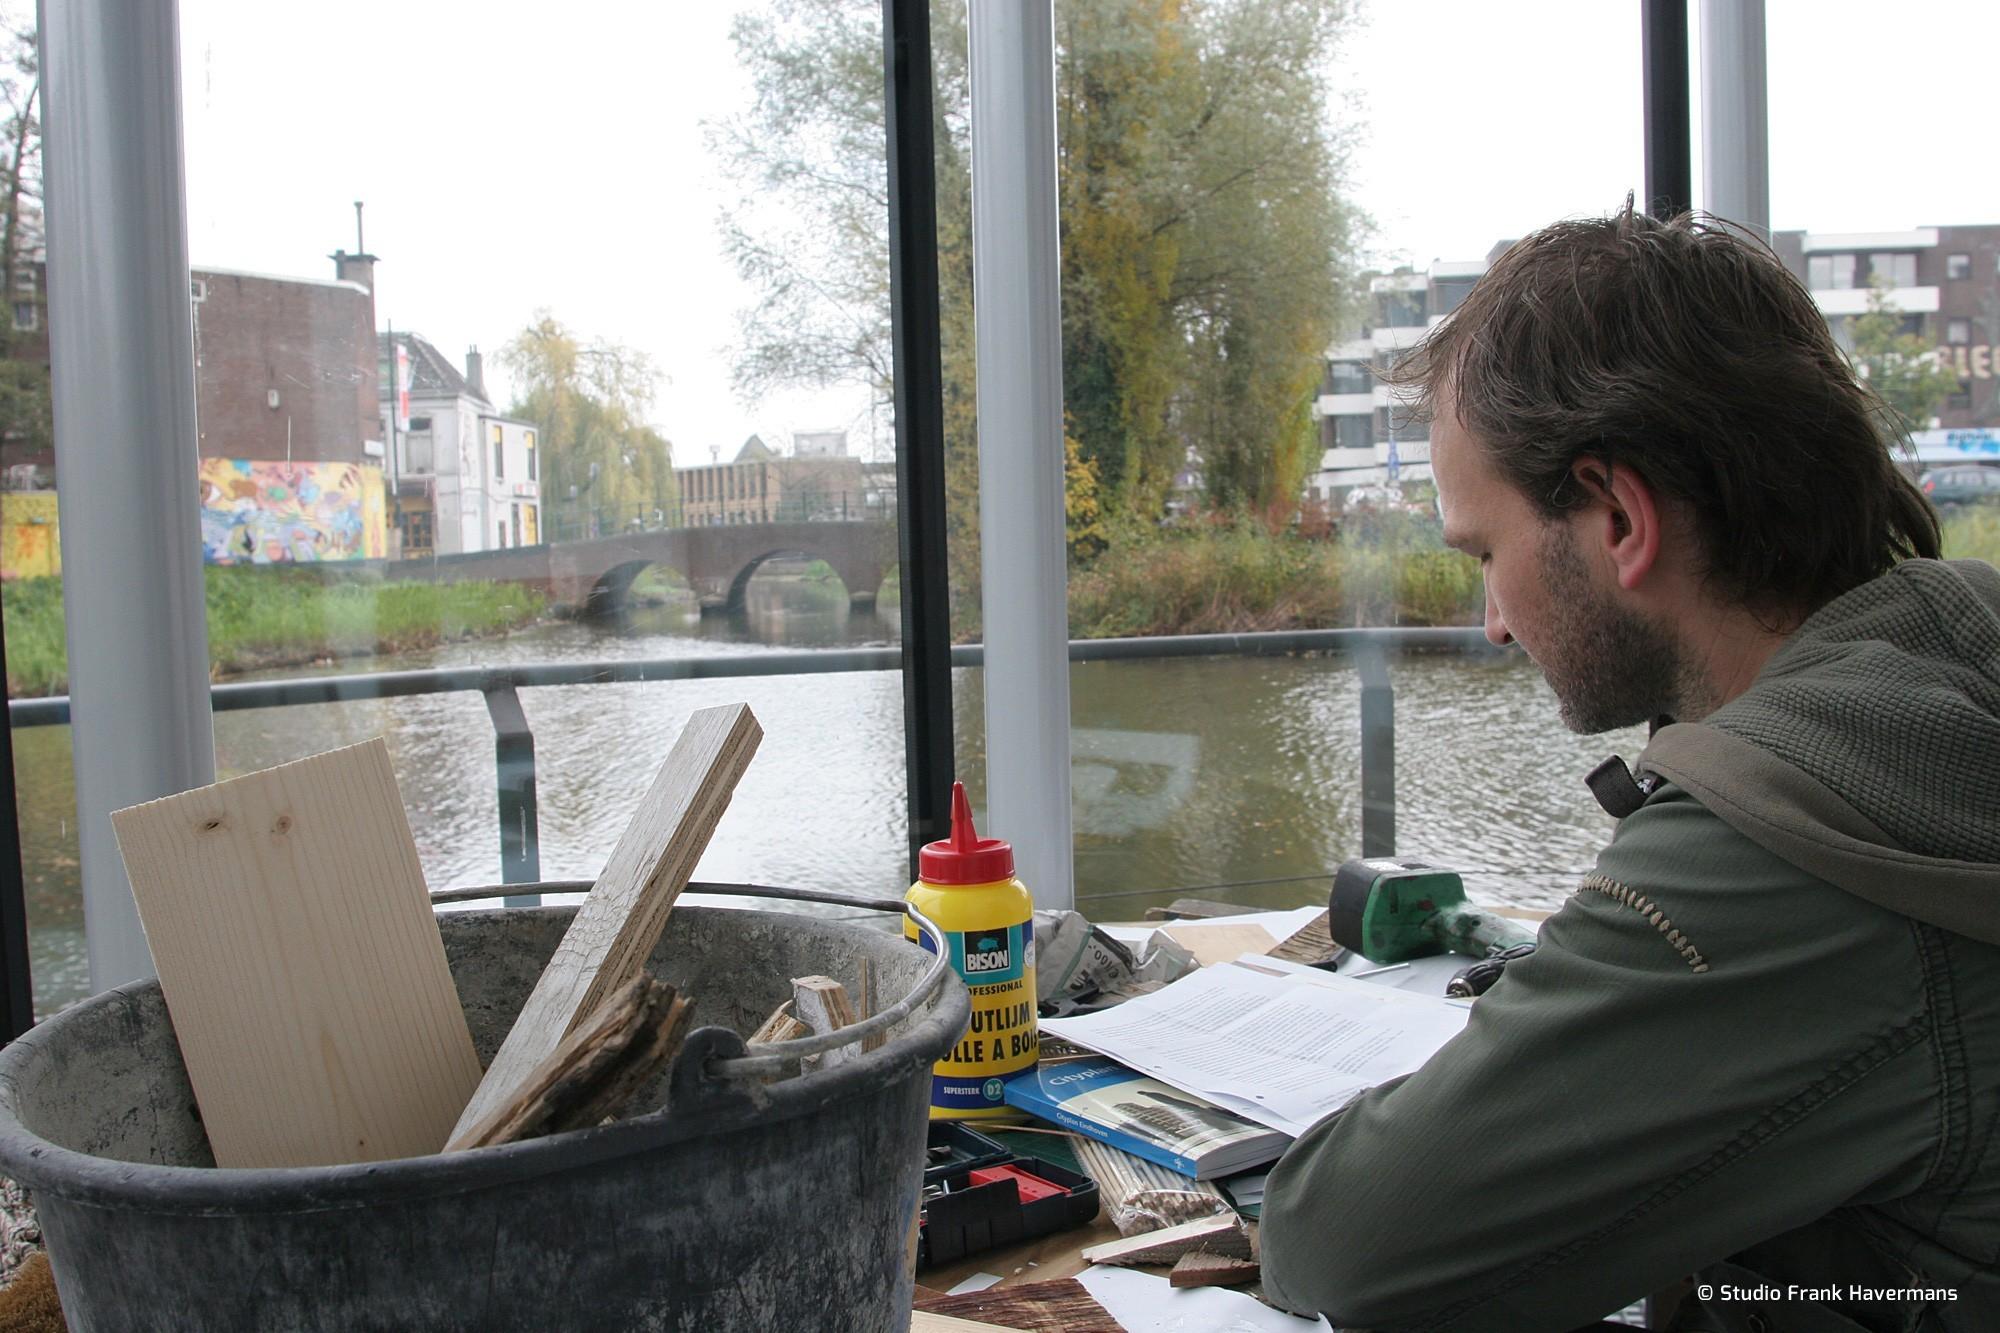 Studio Frank Havermans Tofud Eindhoven